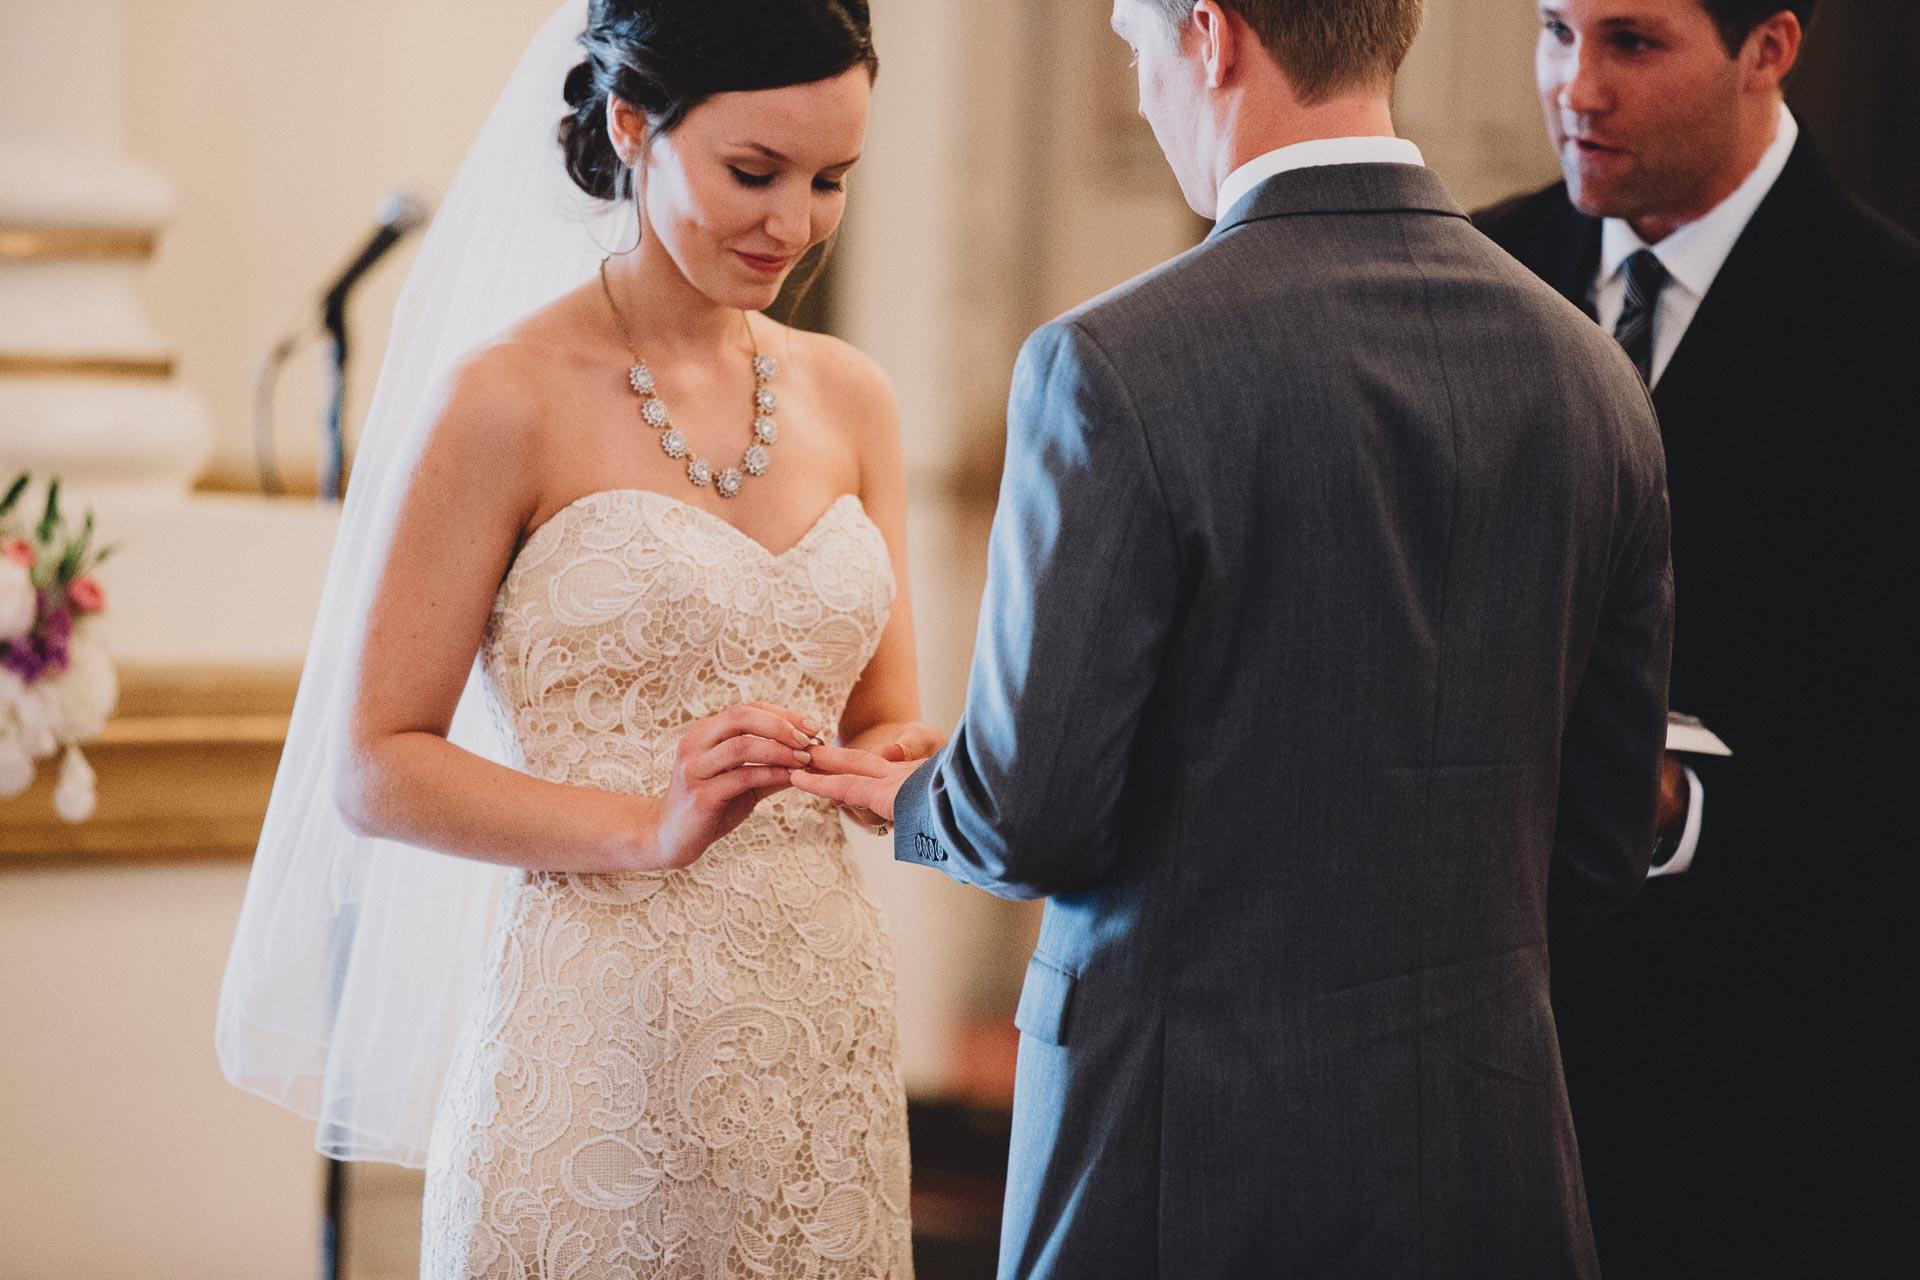 Julia-Michael-Cincinnati-Music-Hall-Wedding-106@2x.jpg